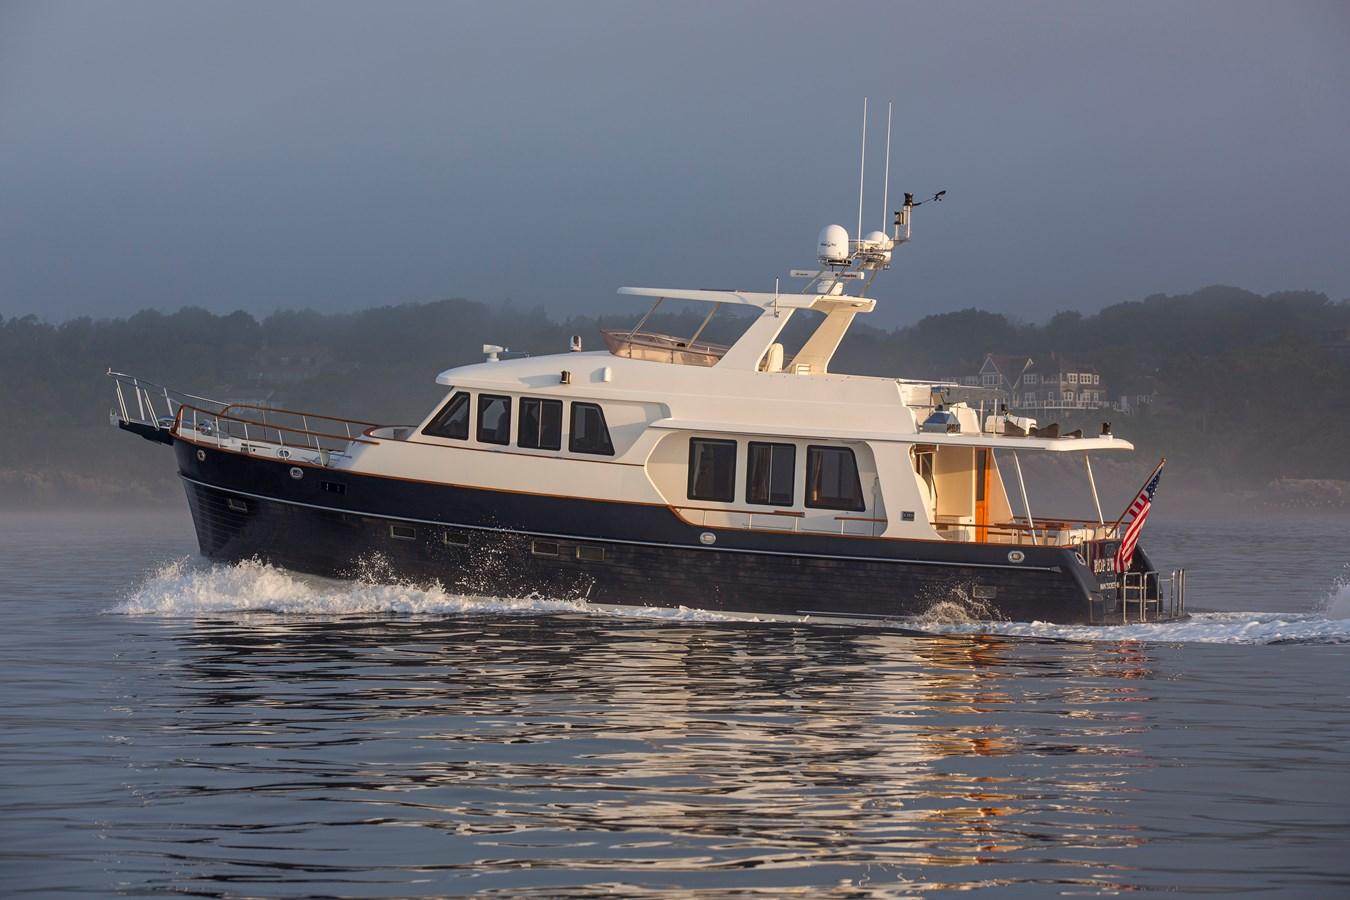 14 Knot Cruise 2006 GRAND BANKS 59 Aleutian RP Motor Yacht 2690068